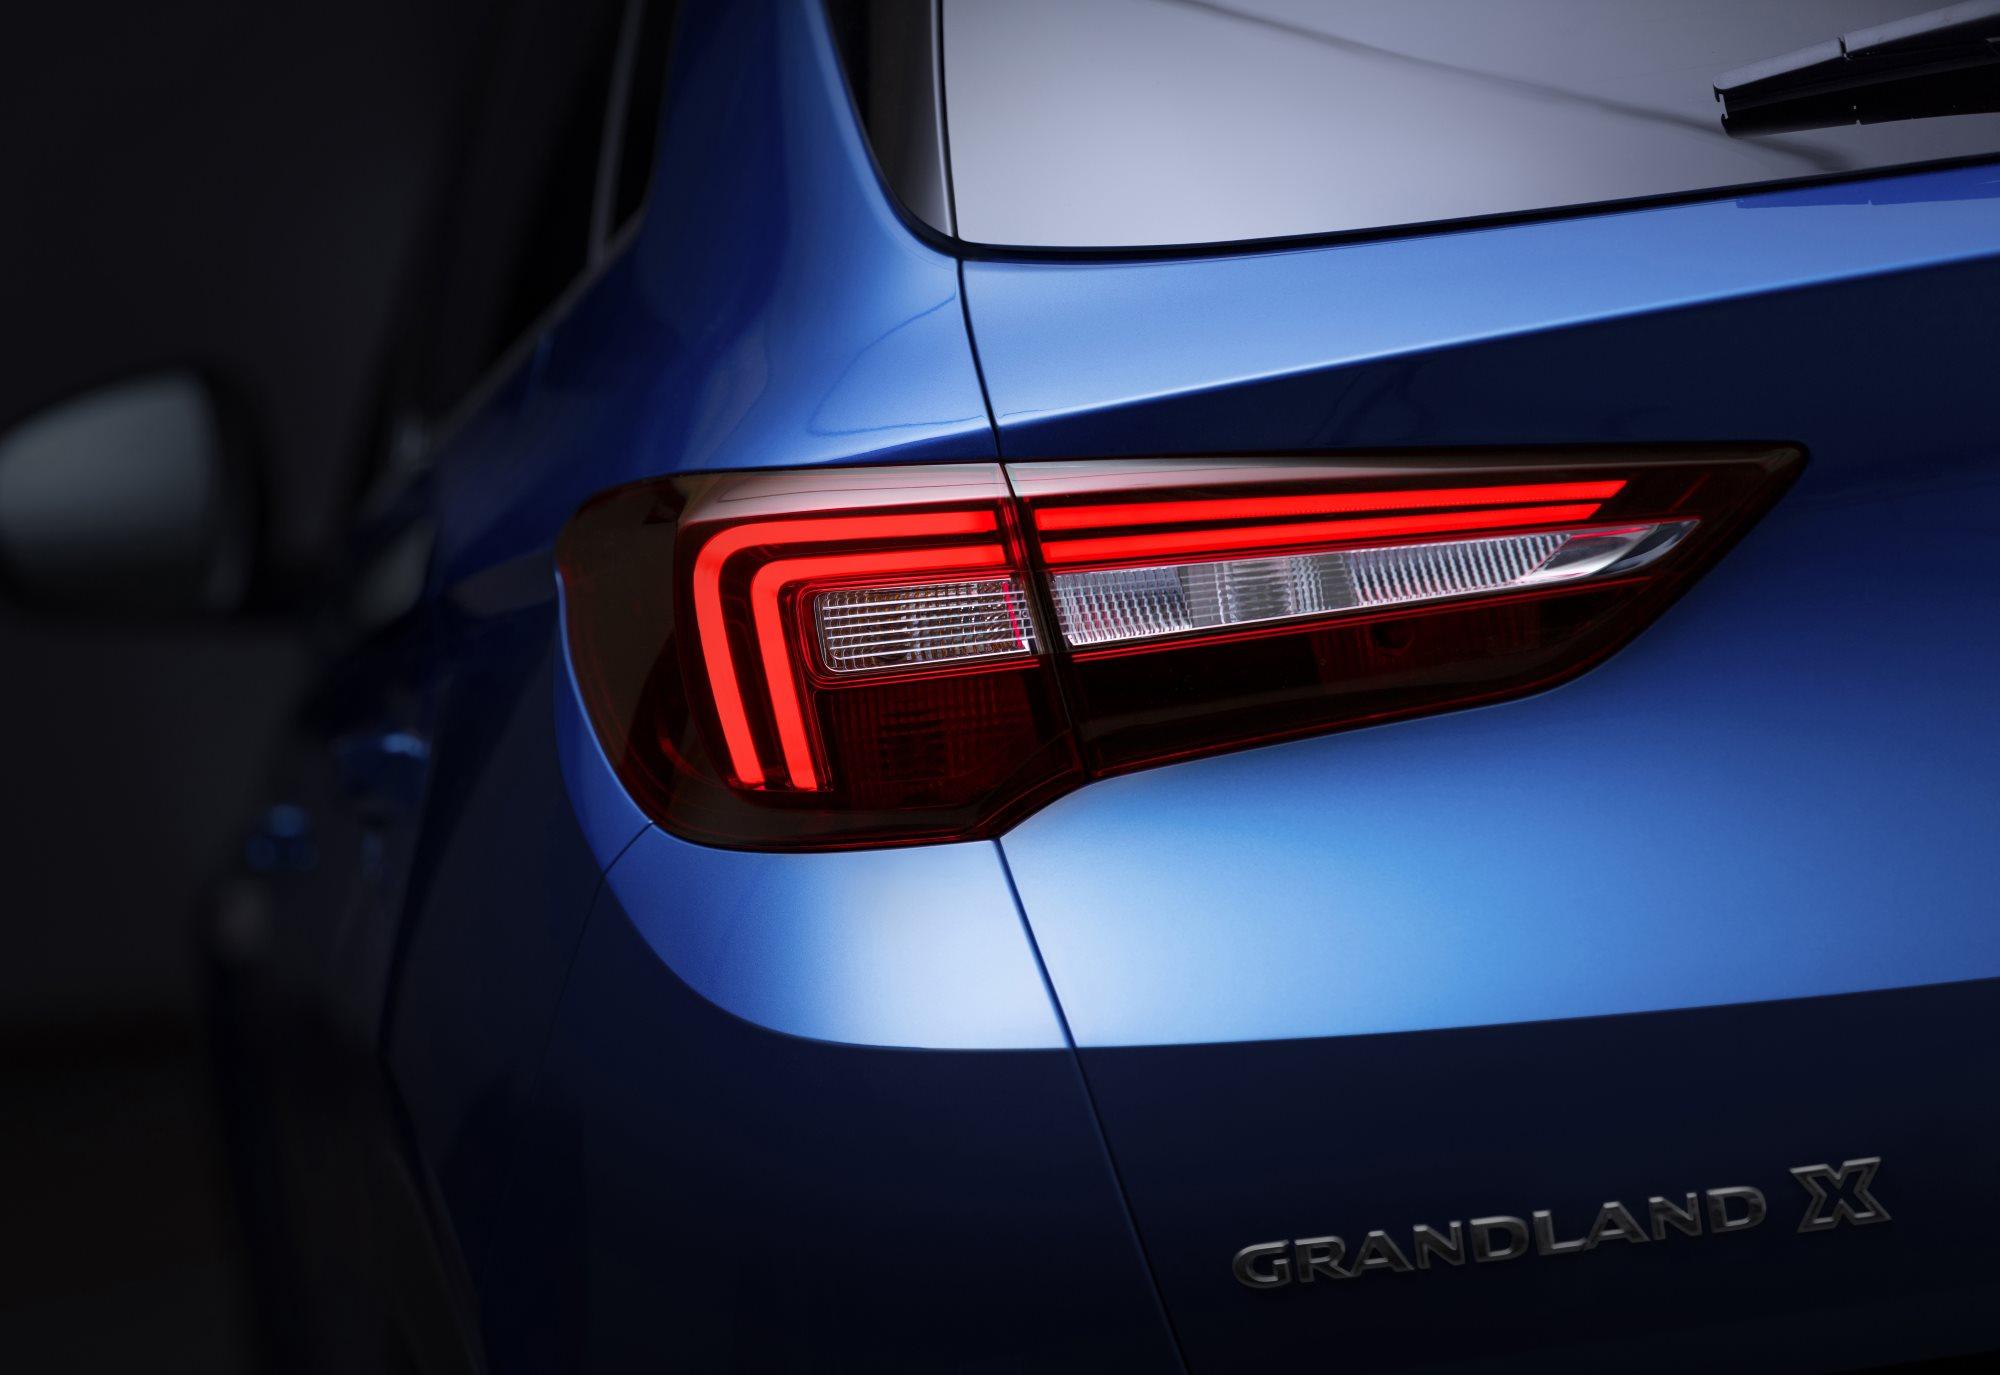 Vauxhall-Grandland-X-304125.jpg